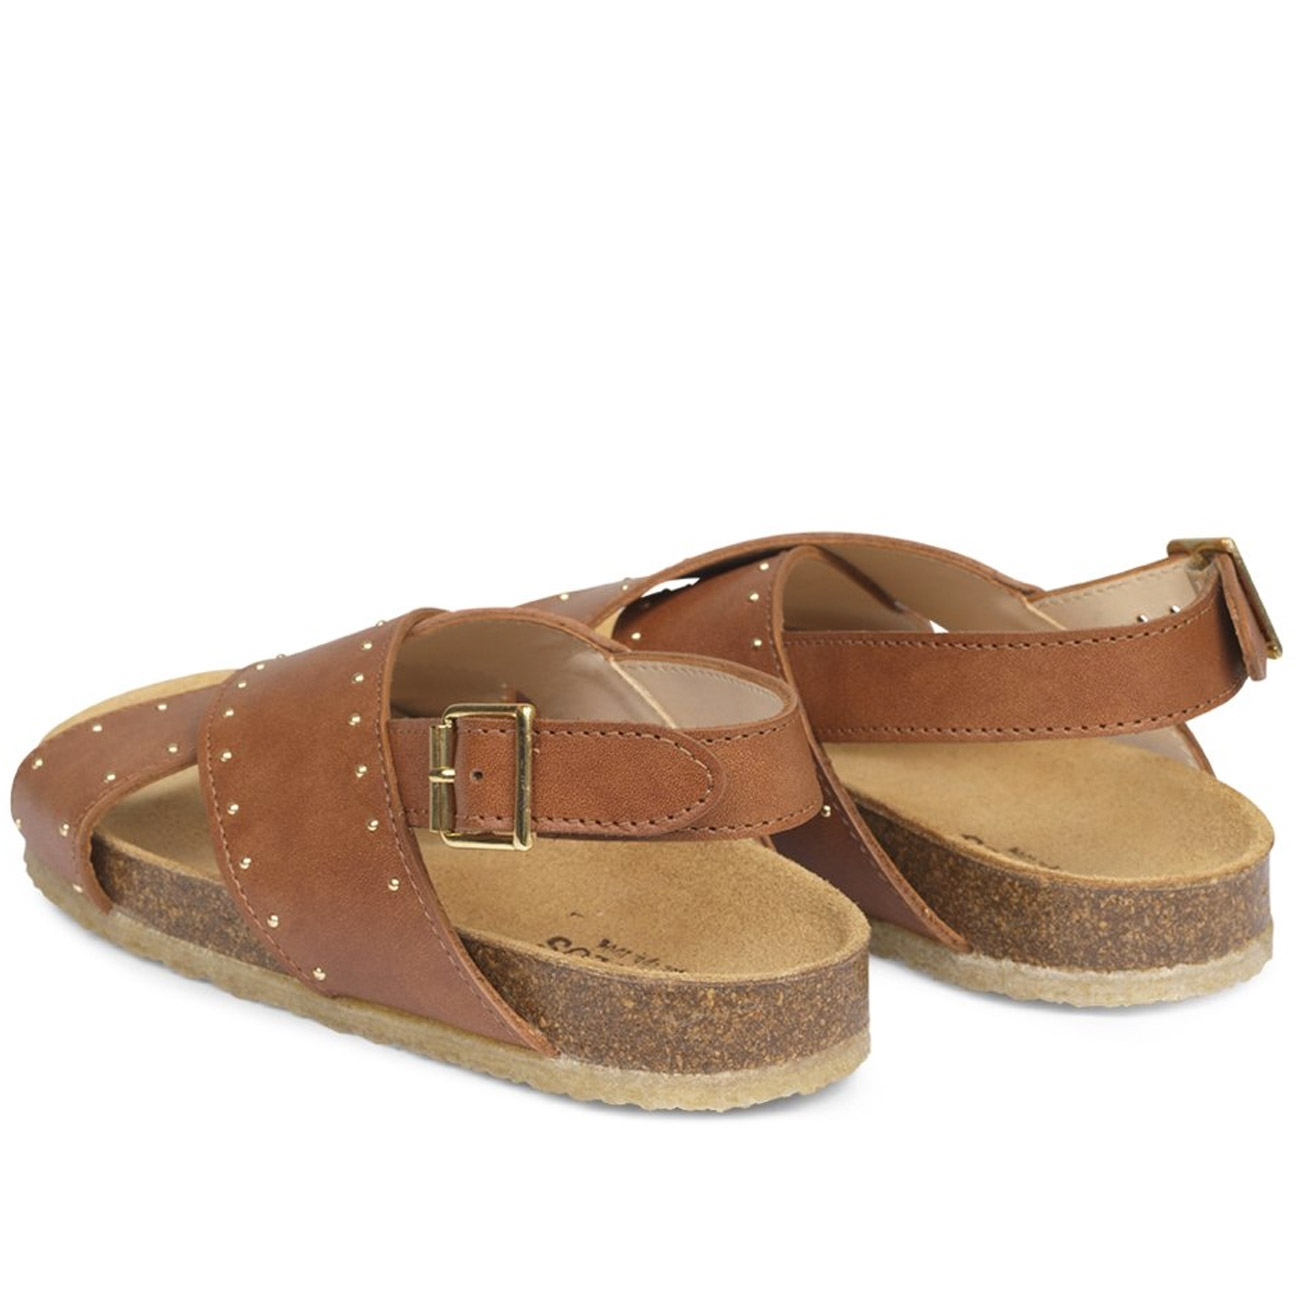 Angulus Sandal Tan 4430 101 1789